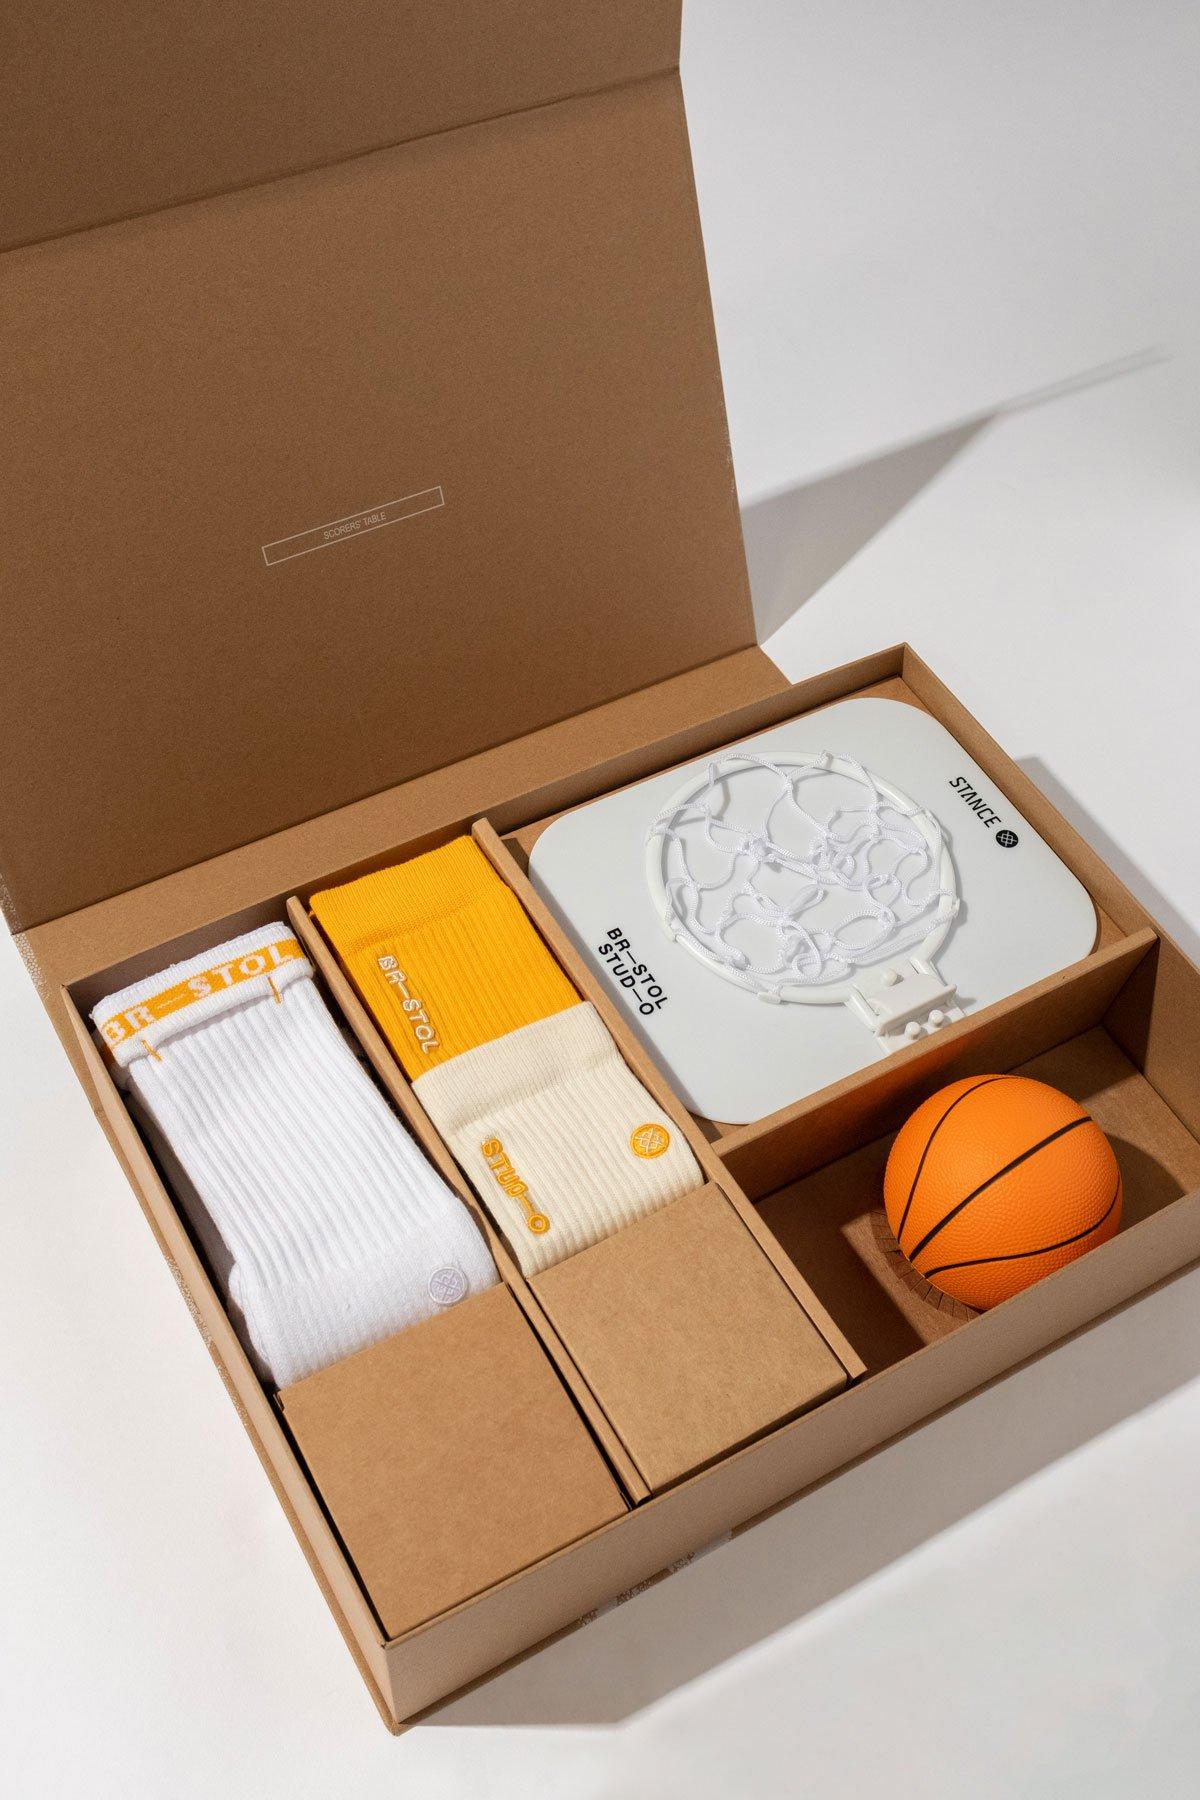 Stance x Bristol Studio Collaborative Box Set